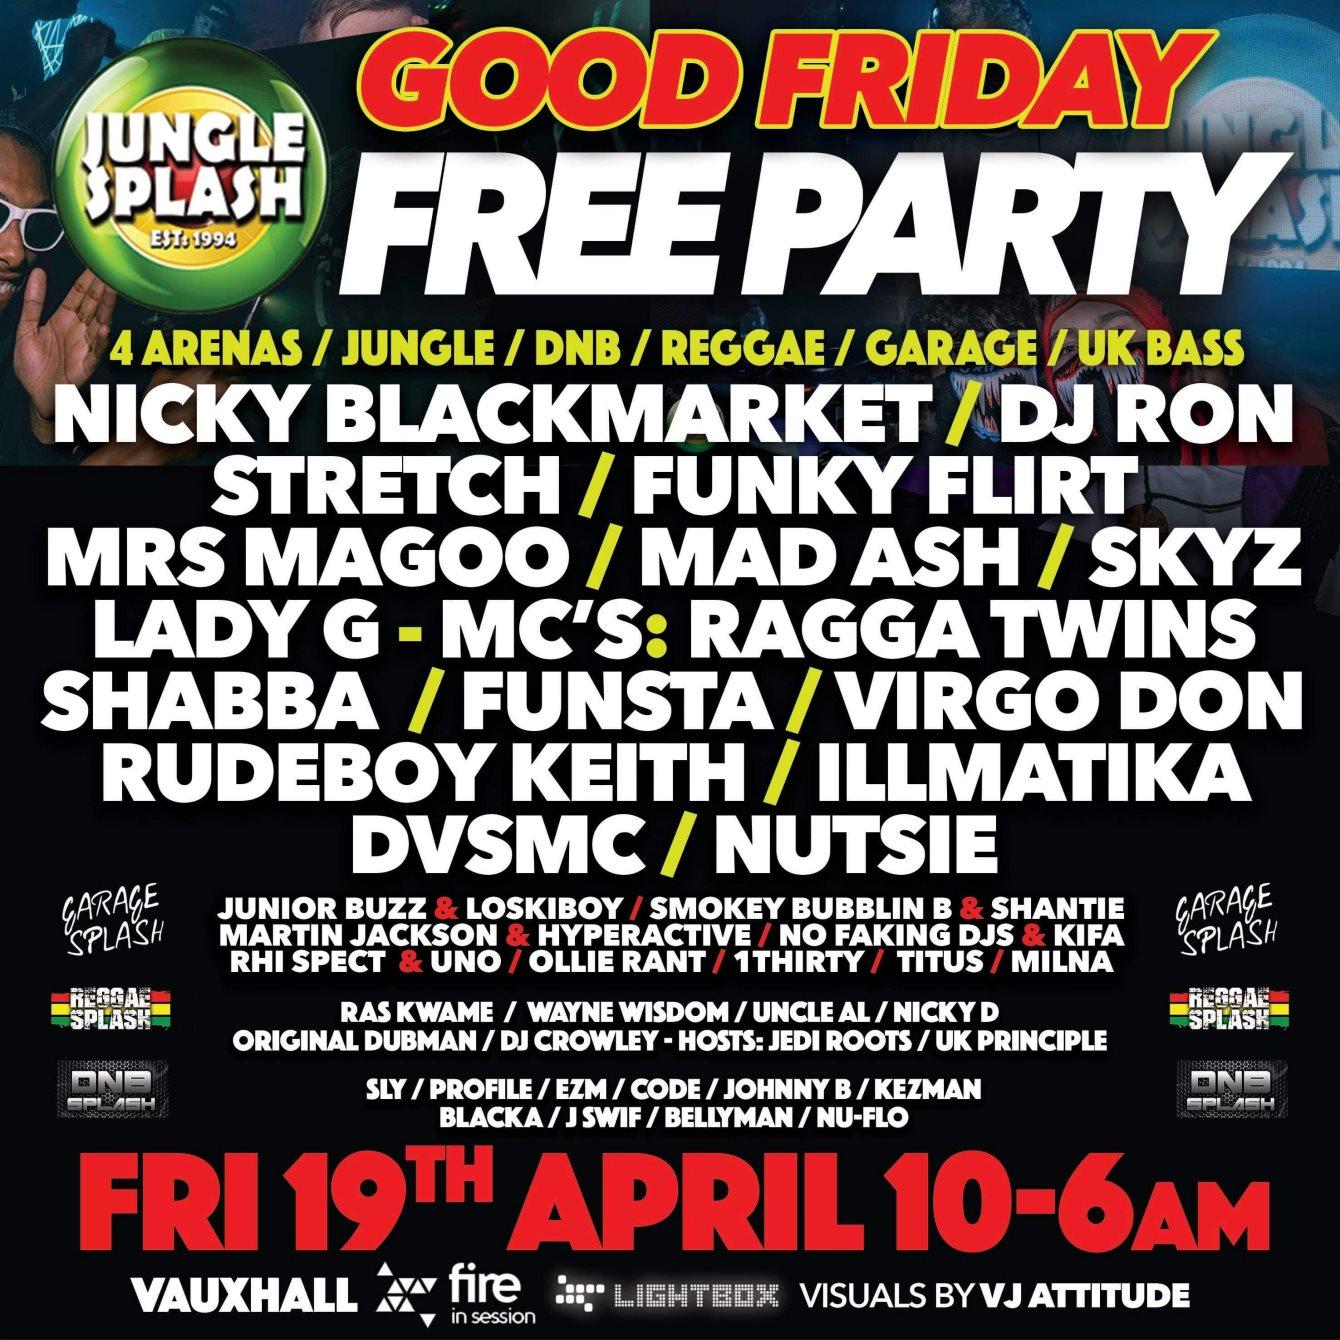 RA: Jungle Splash Free Party at Fire & Lightbox, London